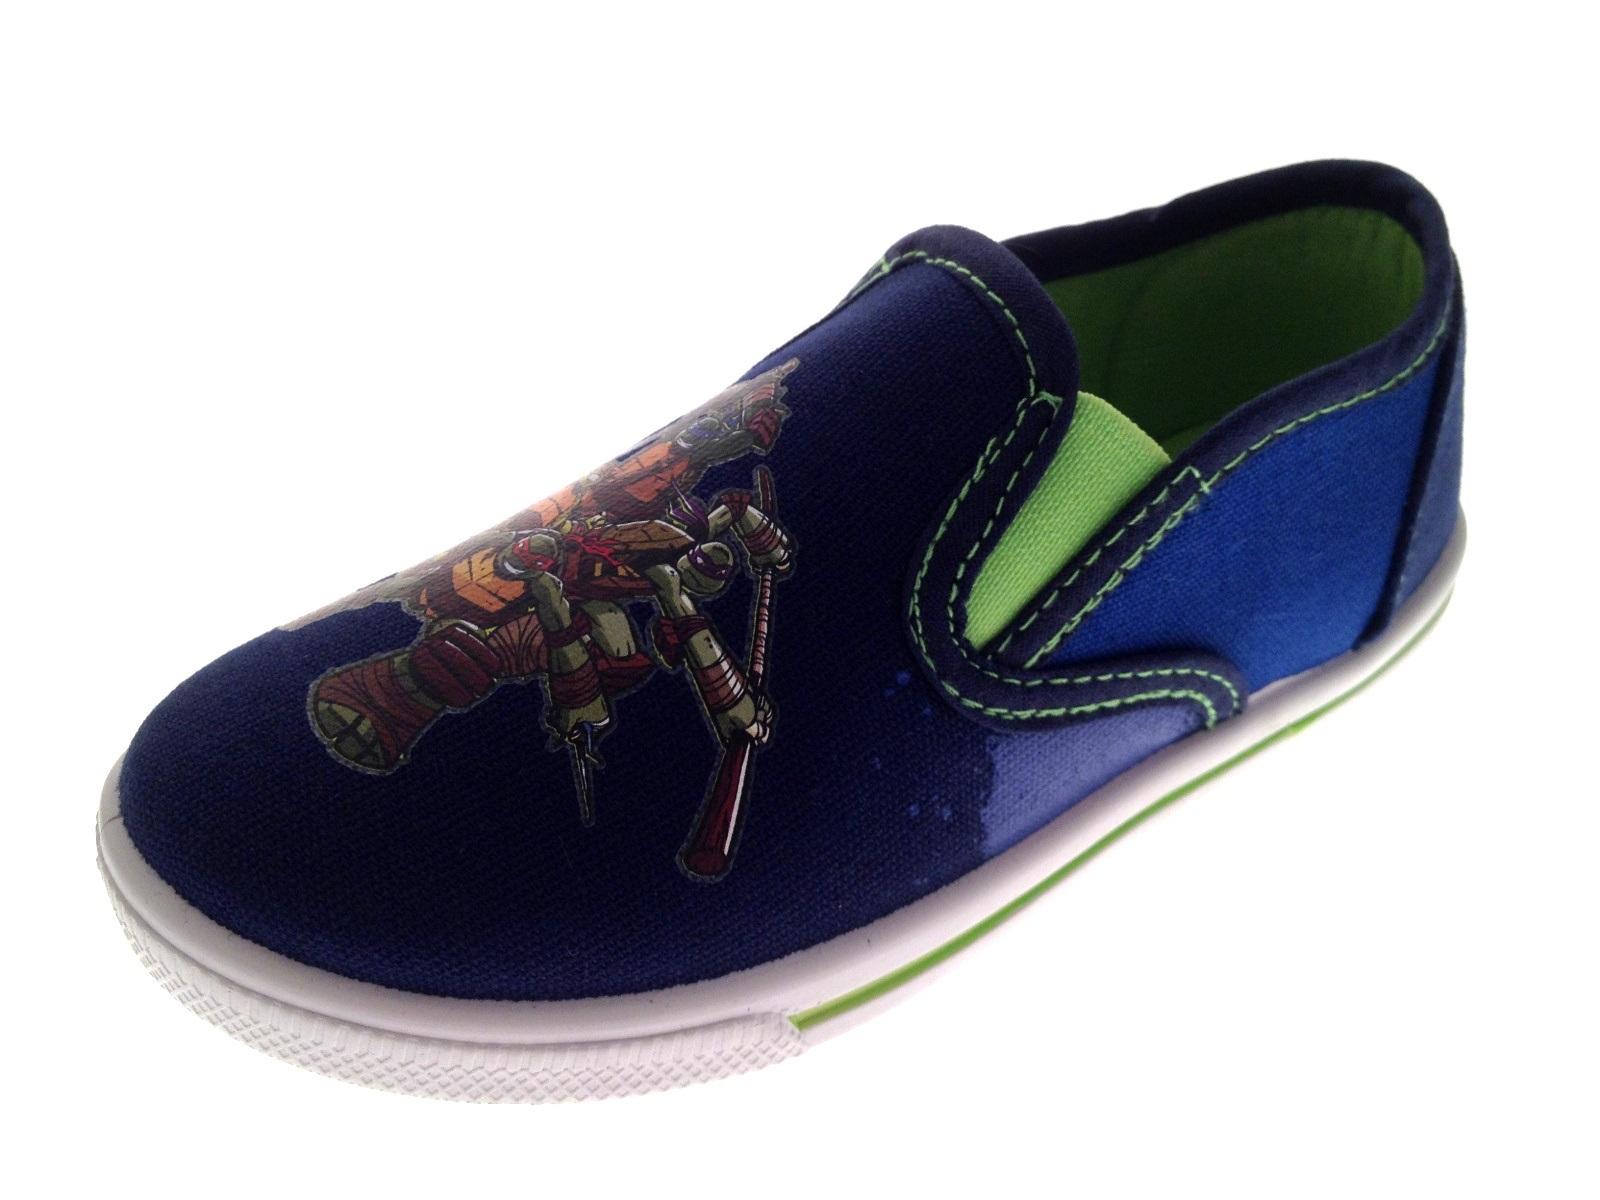 Teenage Mutant Ninja Turtles Canvas Pumps Childrens Boys TMNT Shoes Size UK 9-2 | EBay